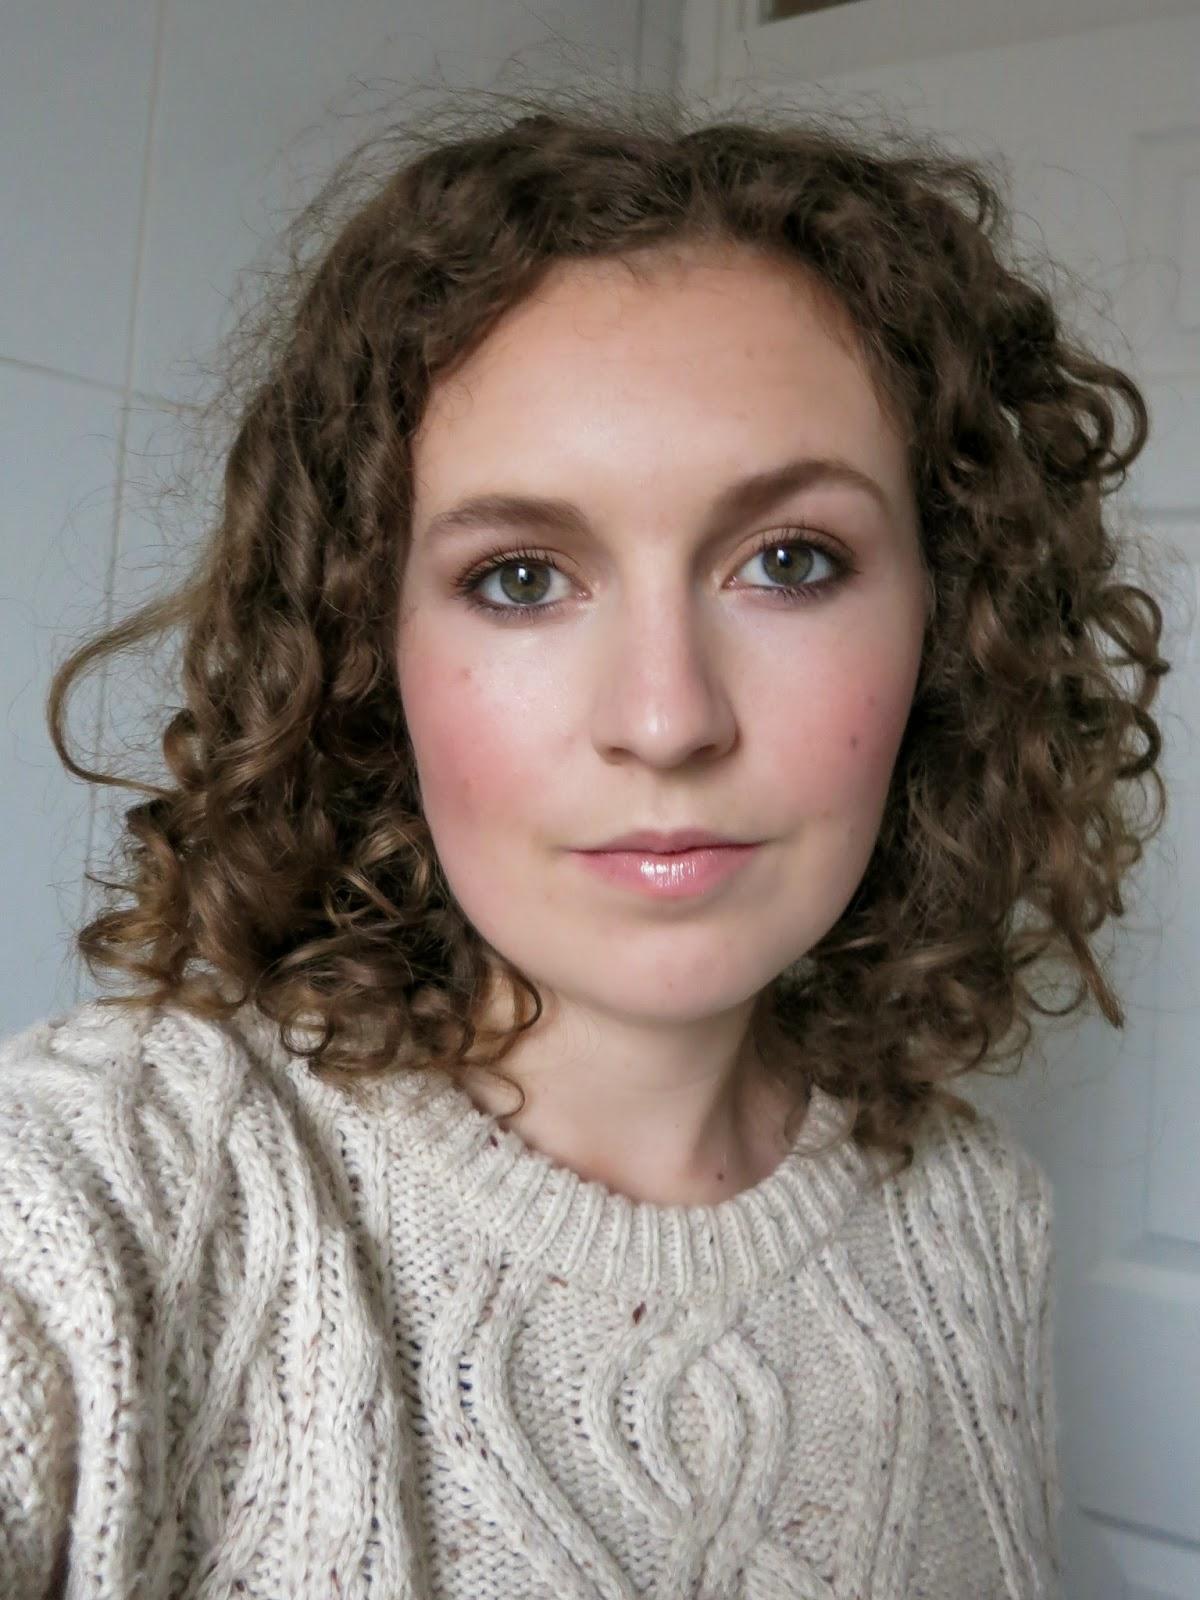 Max Factor CC Pencil Makeup Beauty Concealer Drugstore Skin